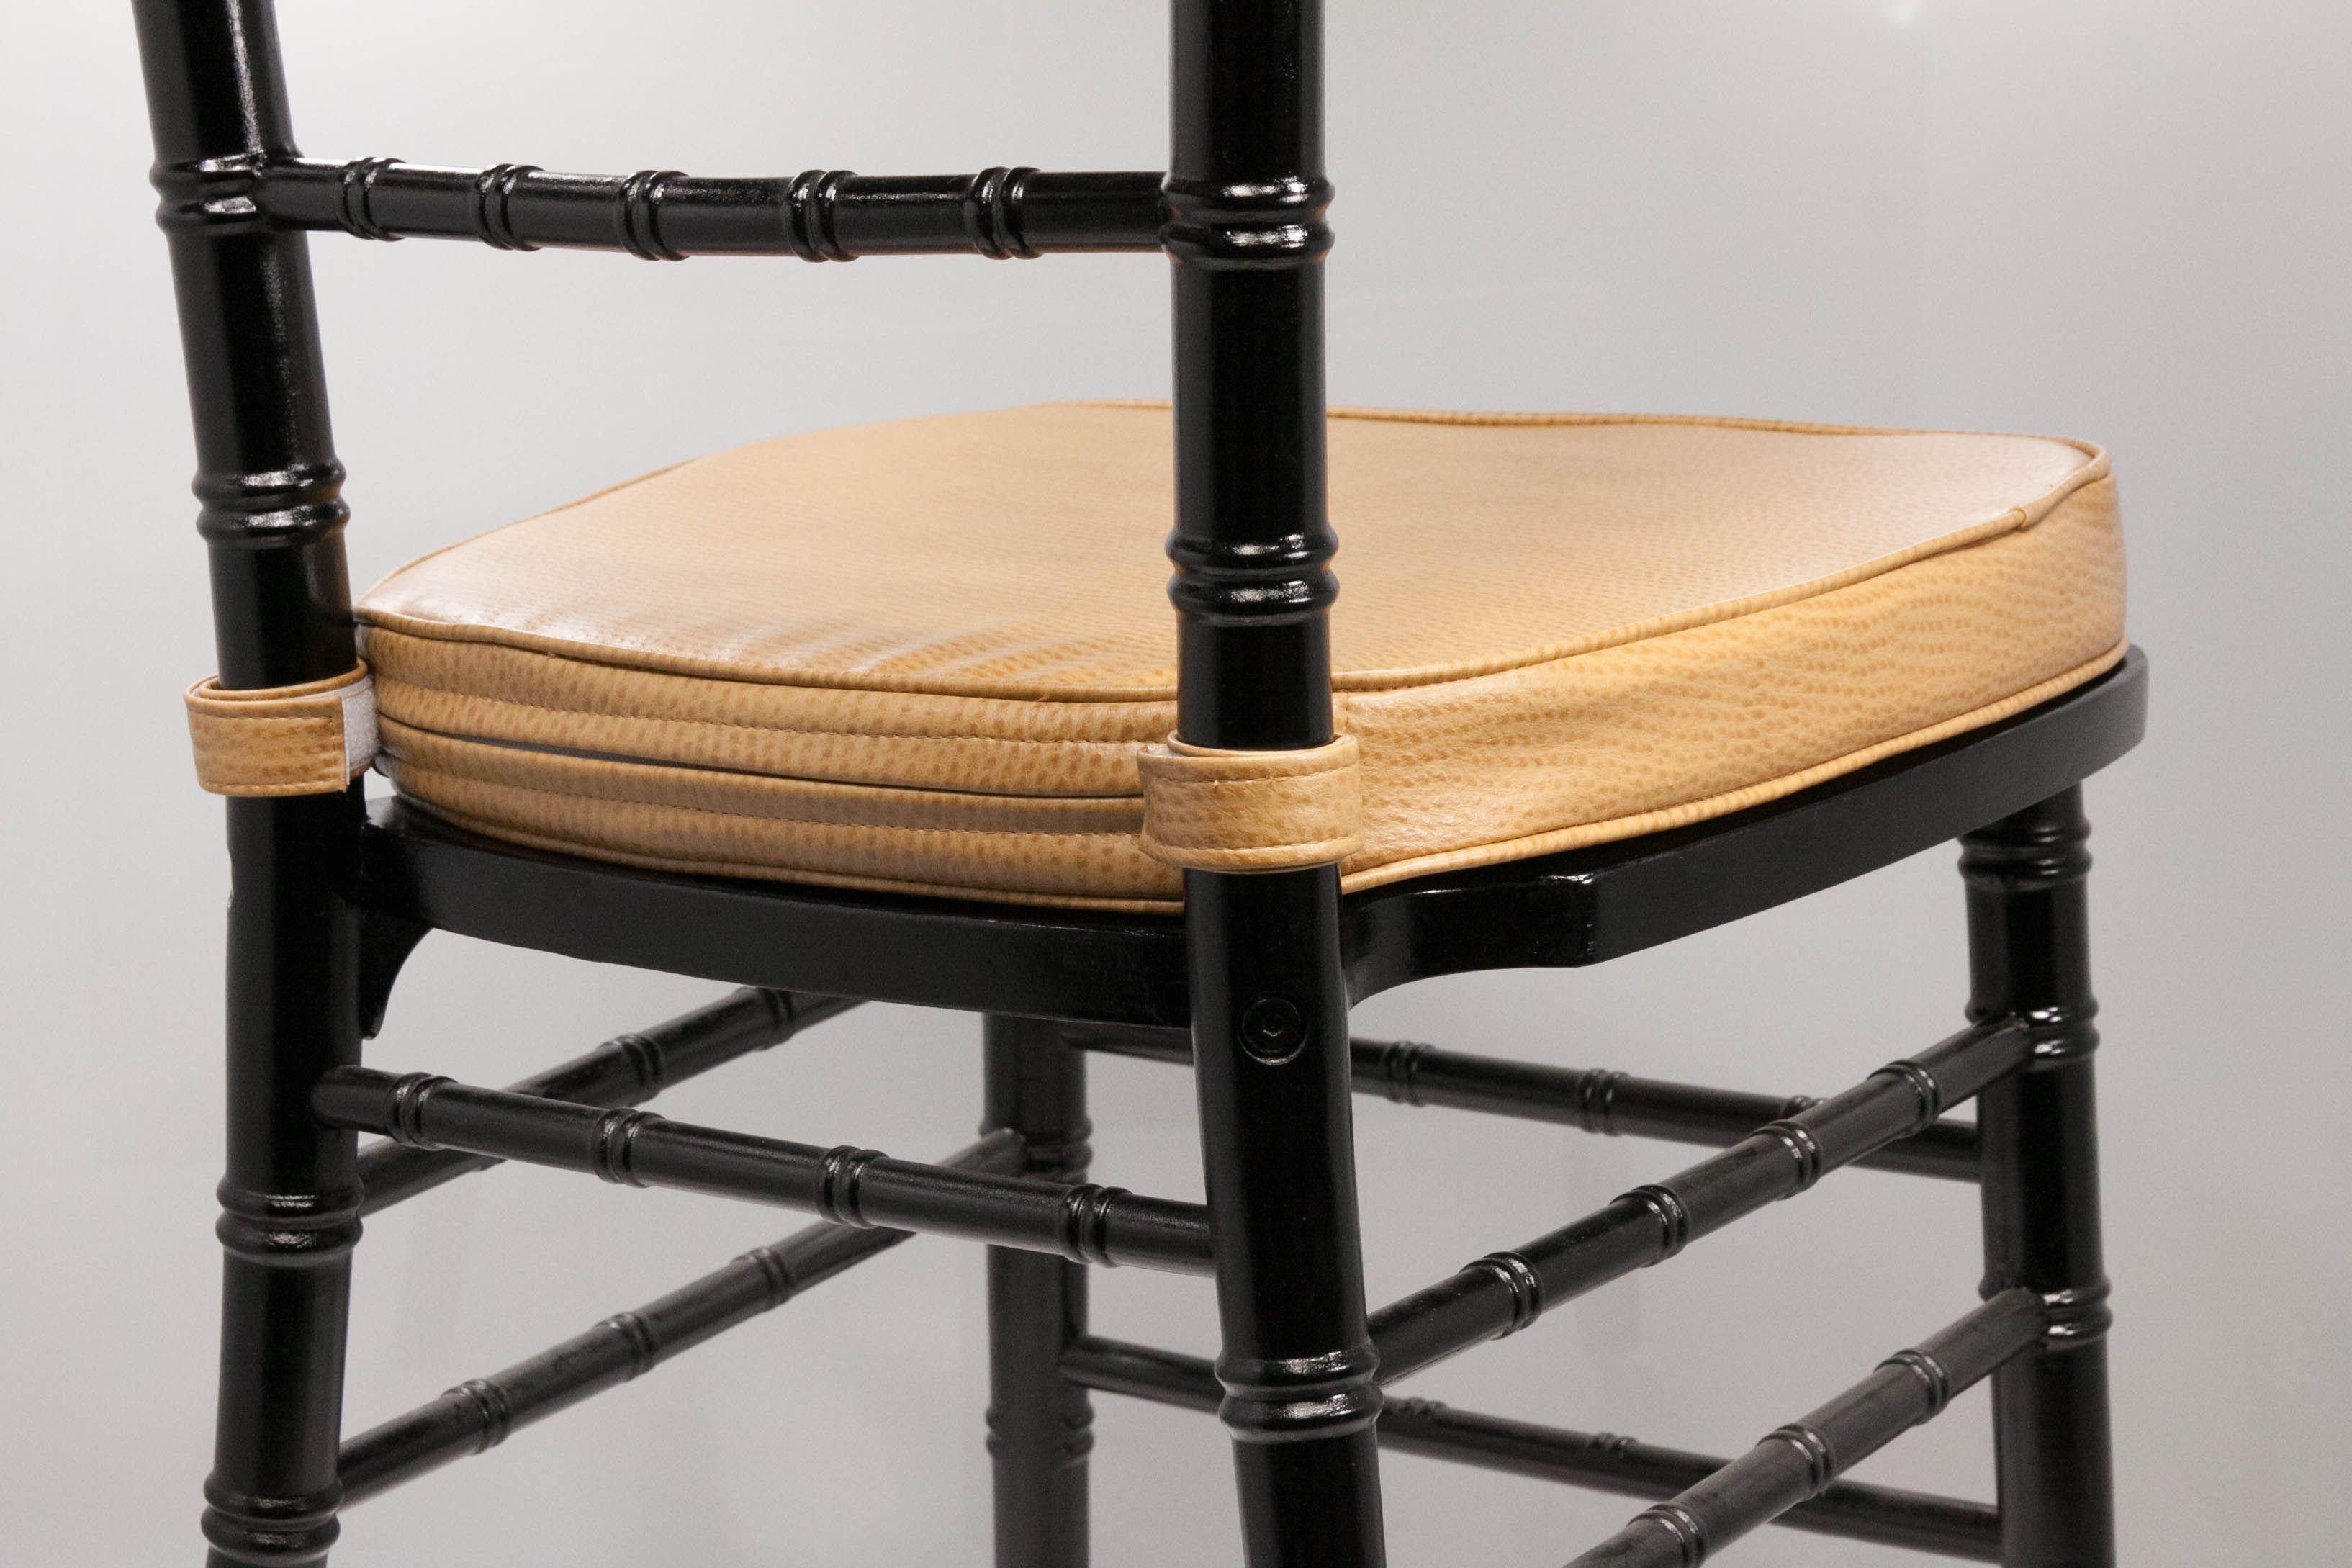 Bon Custom Ostrich Vinyl Chiavari Chair Cushion With Covered Velcro Straps By  Vision Furniture Www.chiavarichairs.com